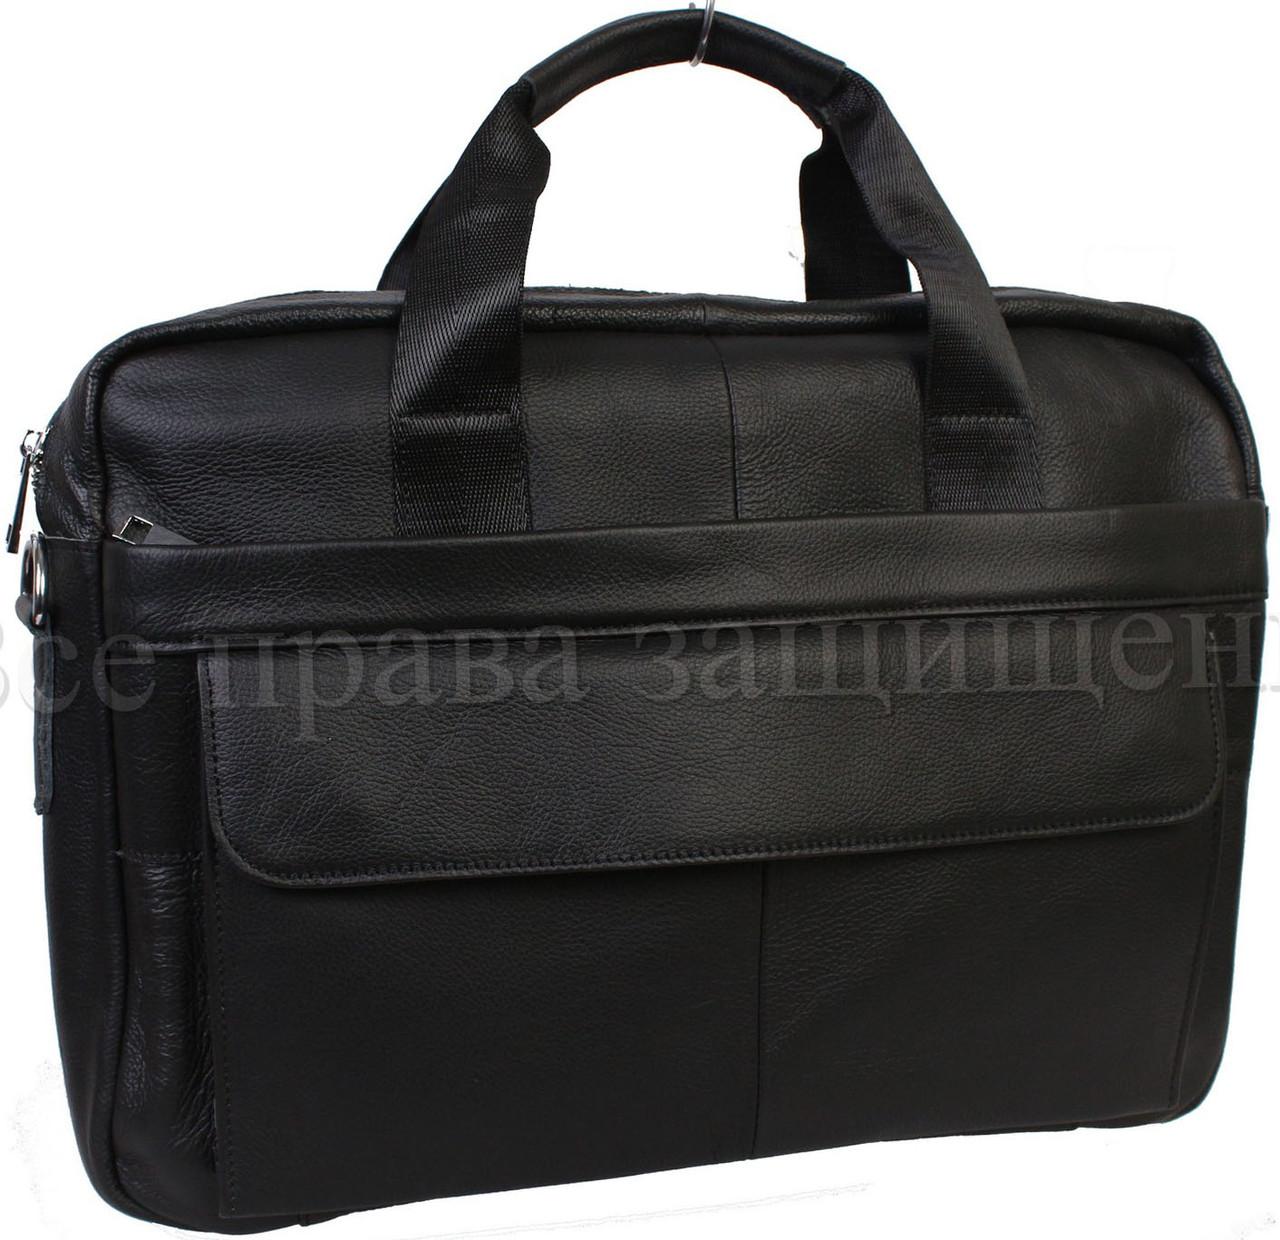 Мужская кожаная сумка черный (Формат: больше А4) NAVI-BAGS NV-9022-black